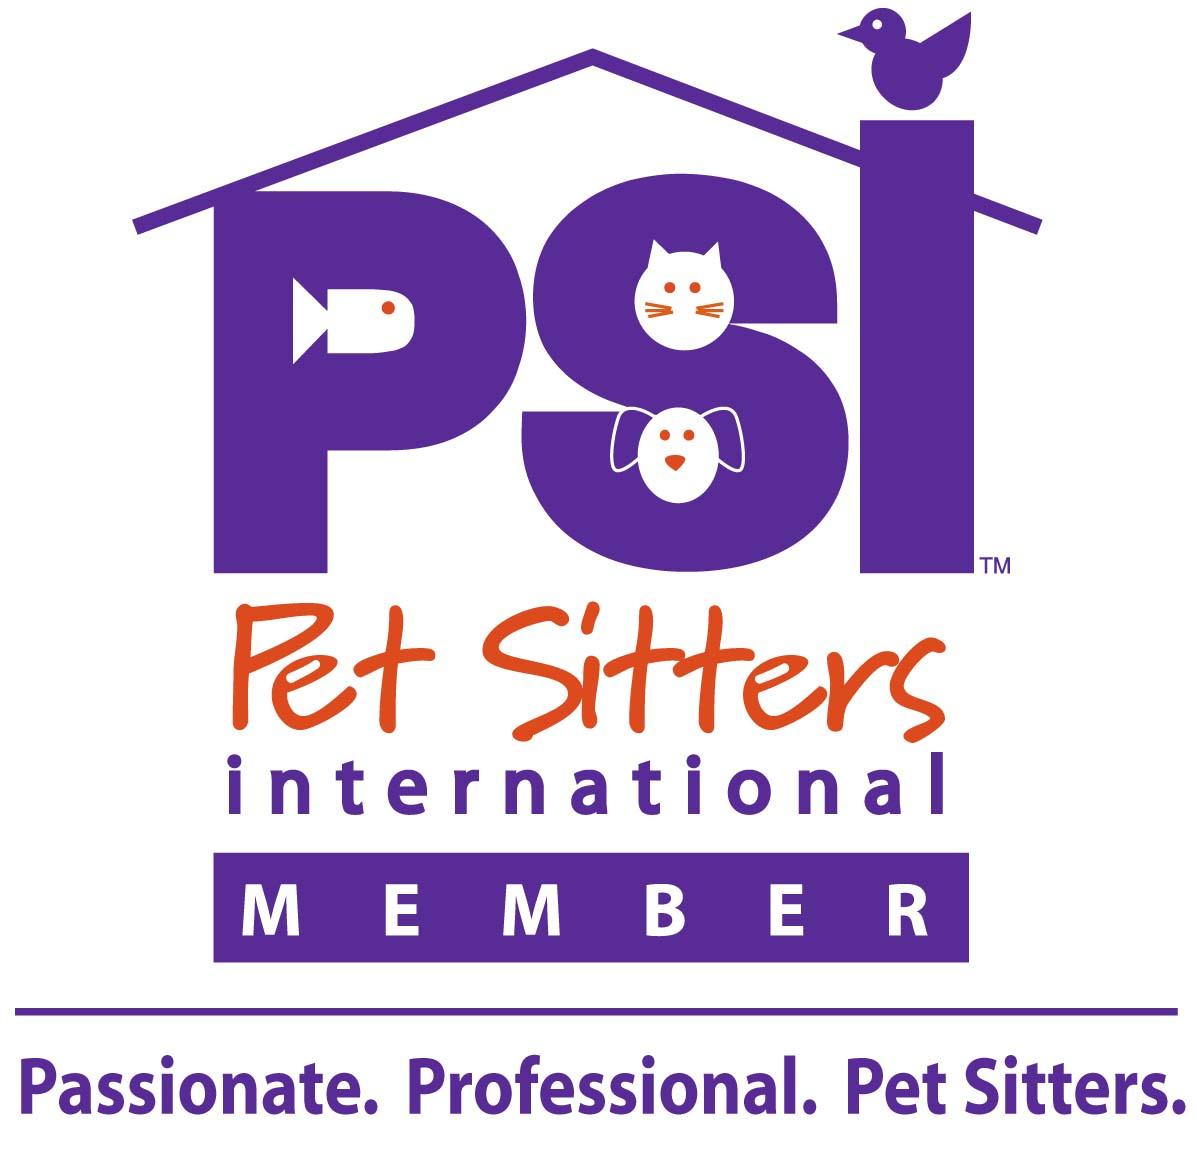 Pet Sitters International Member Logo photo - 1